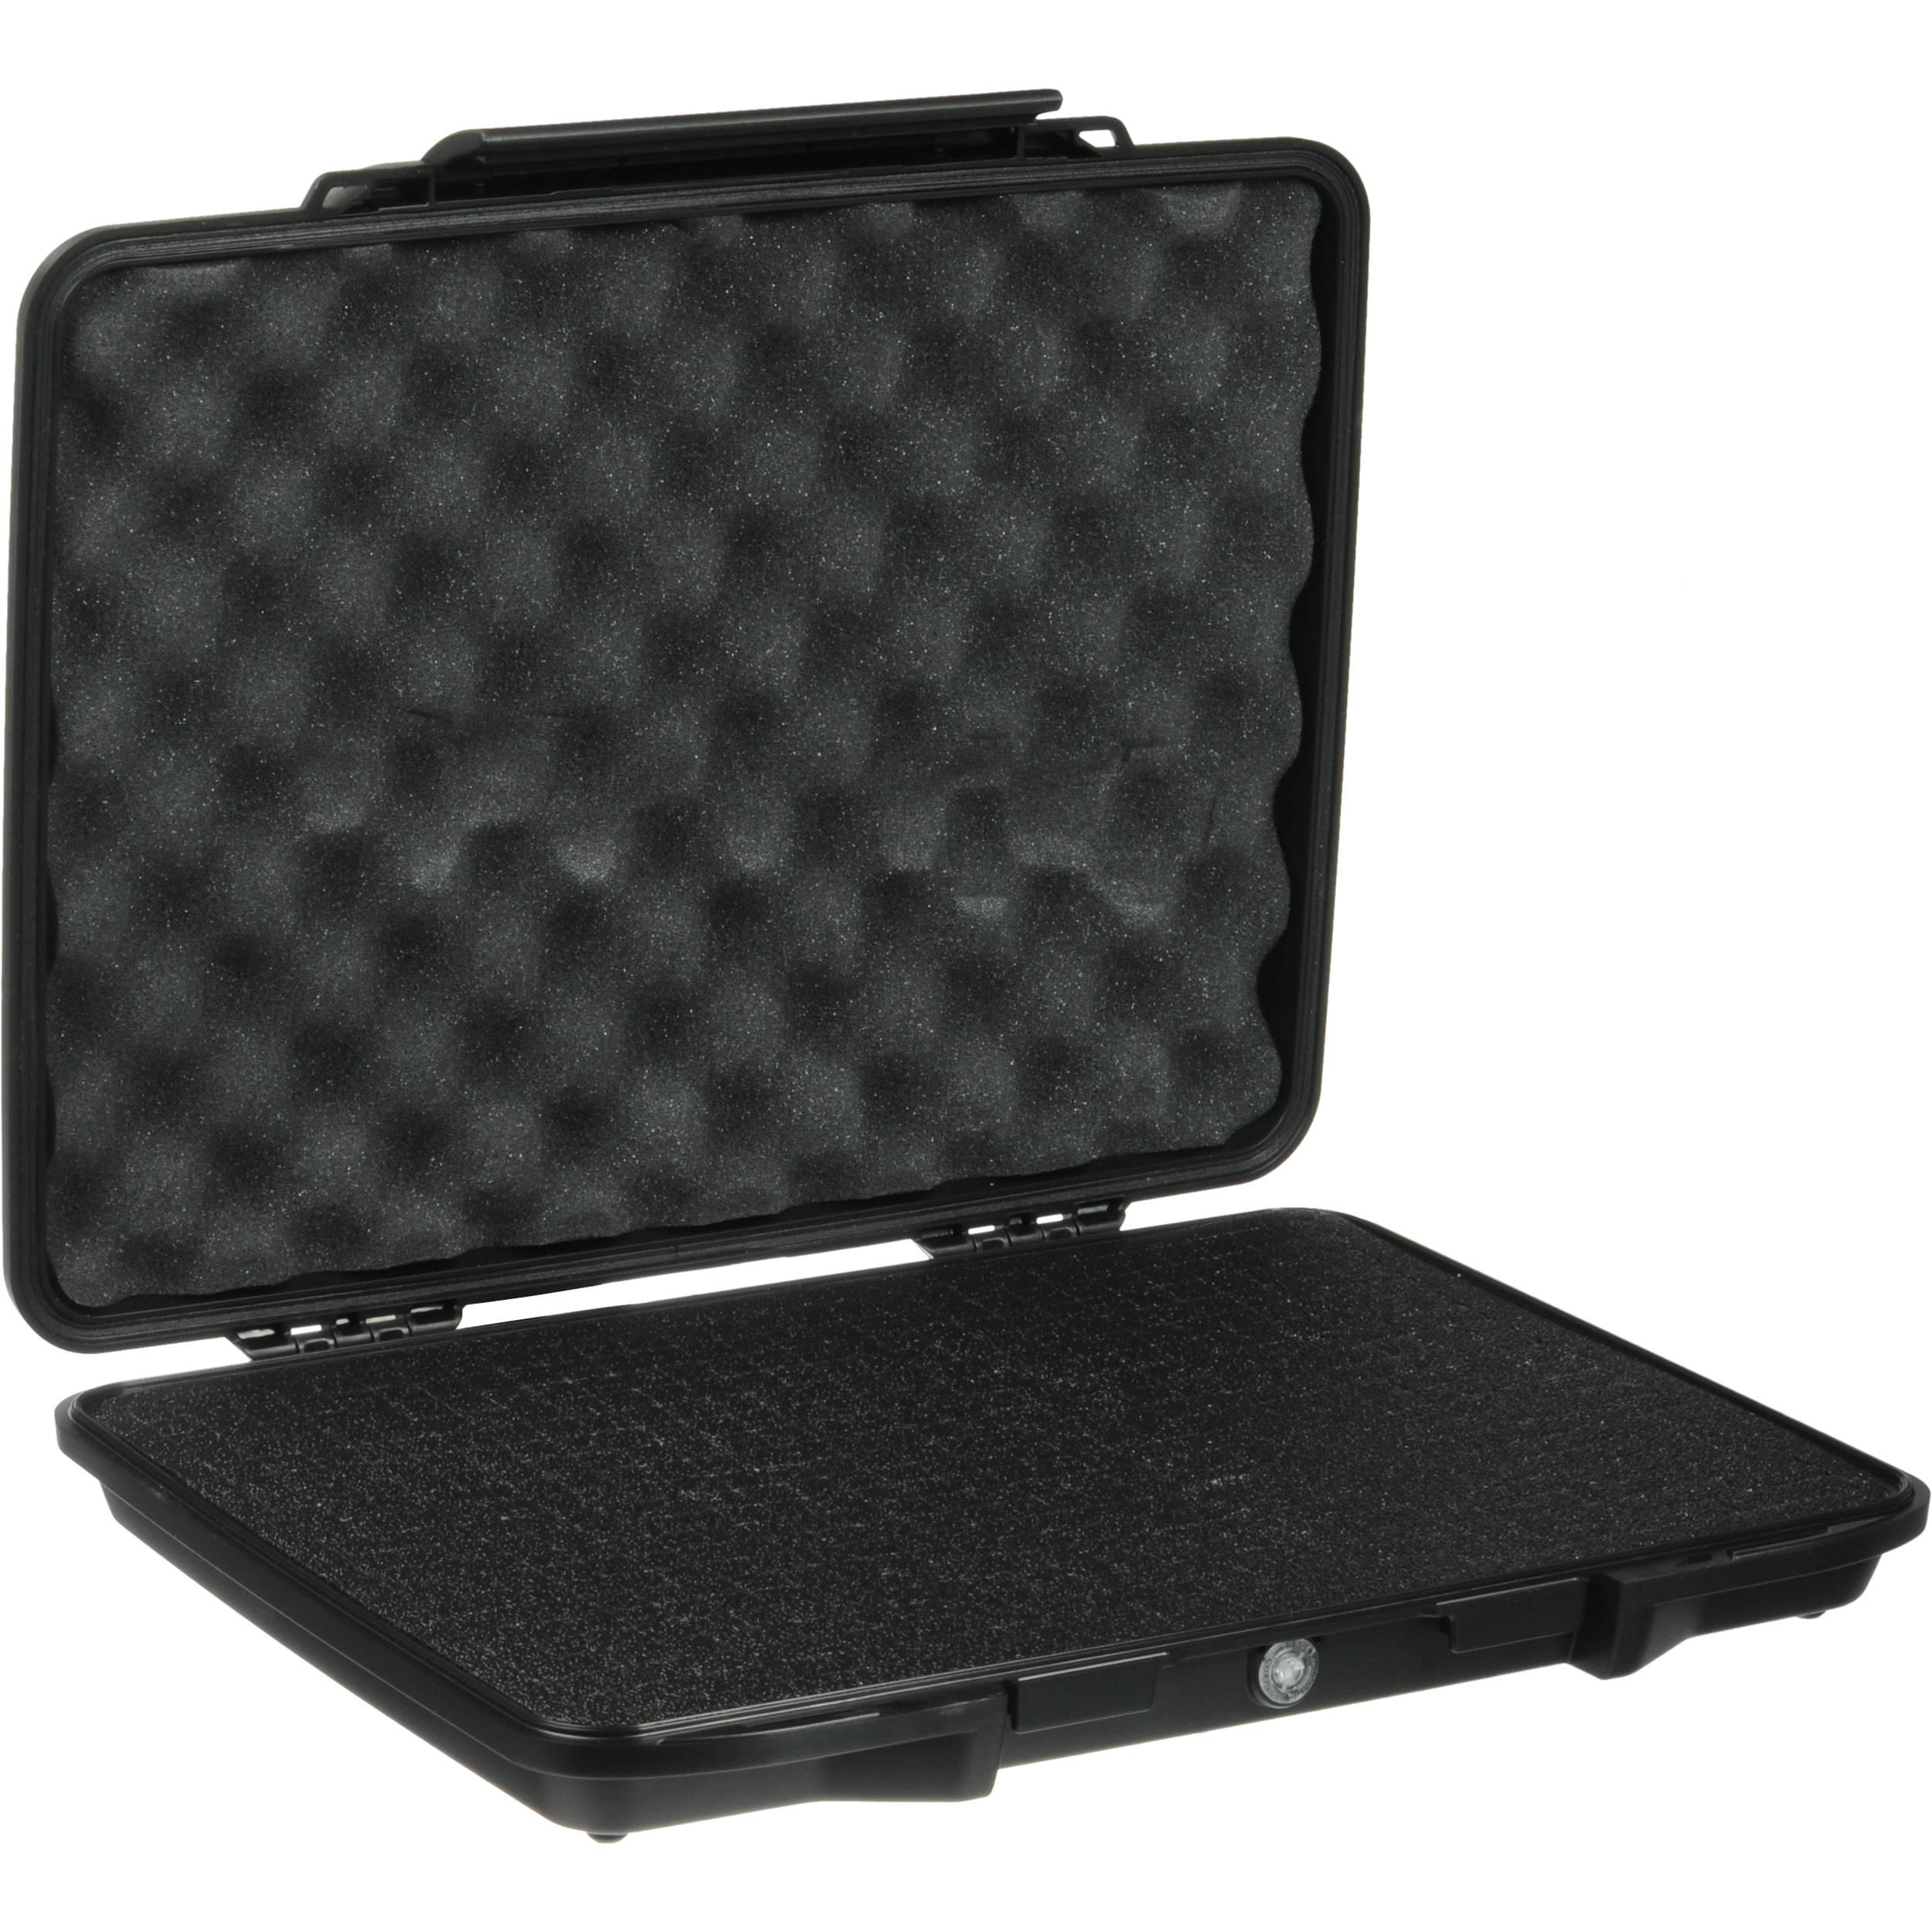 11fbc4b6428 Pelican 1085 Hardback Laptop Computer Case with Foam (Black)